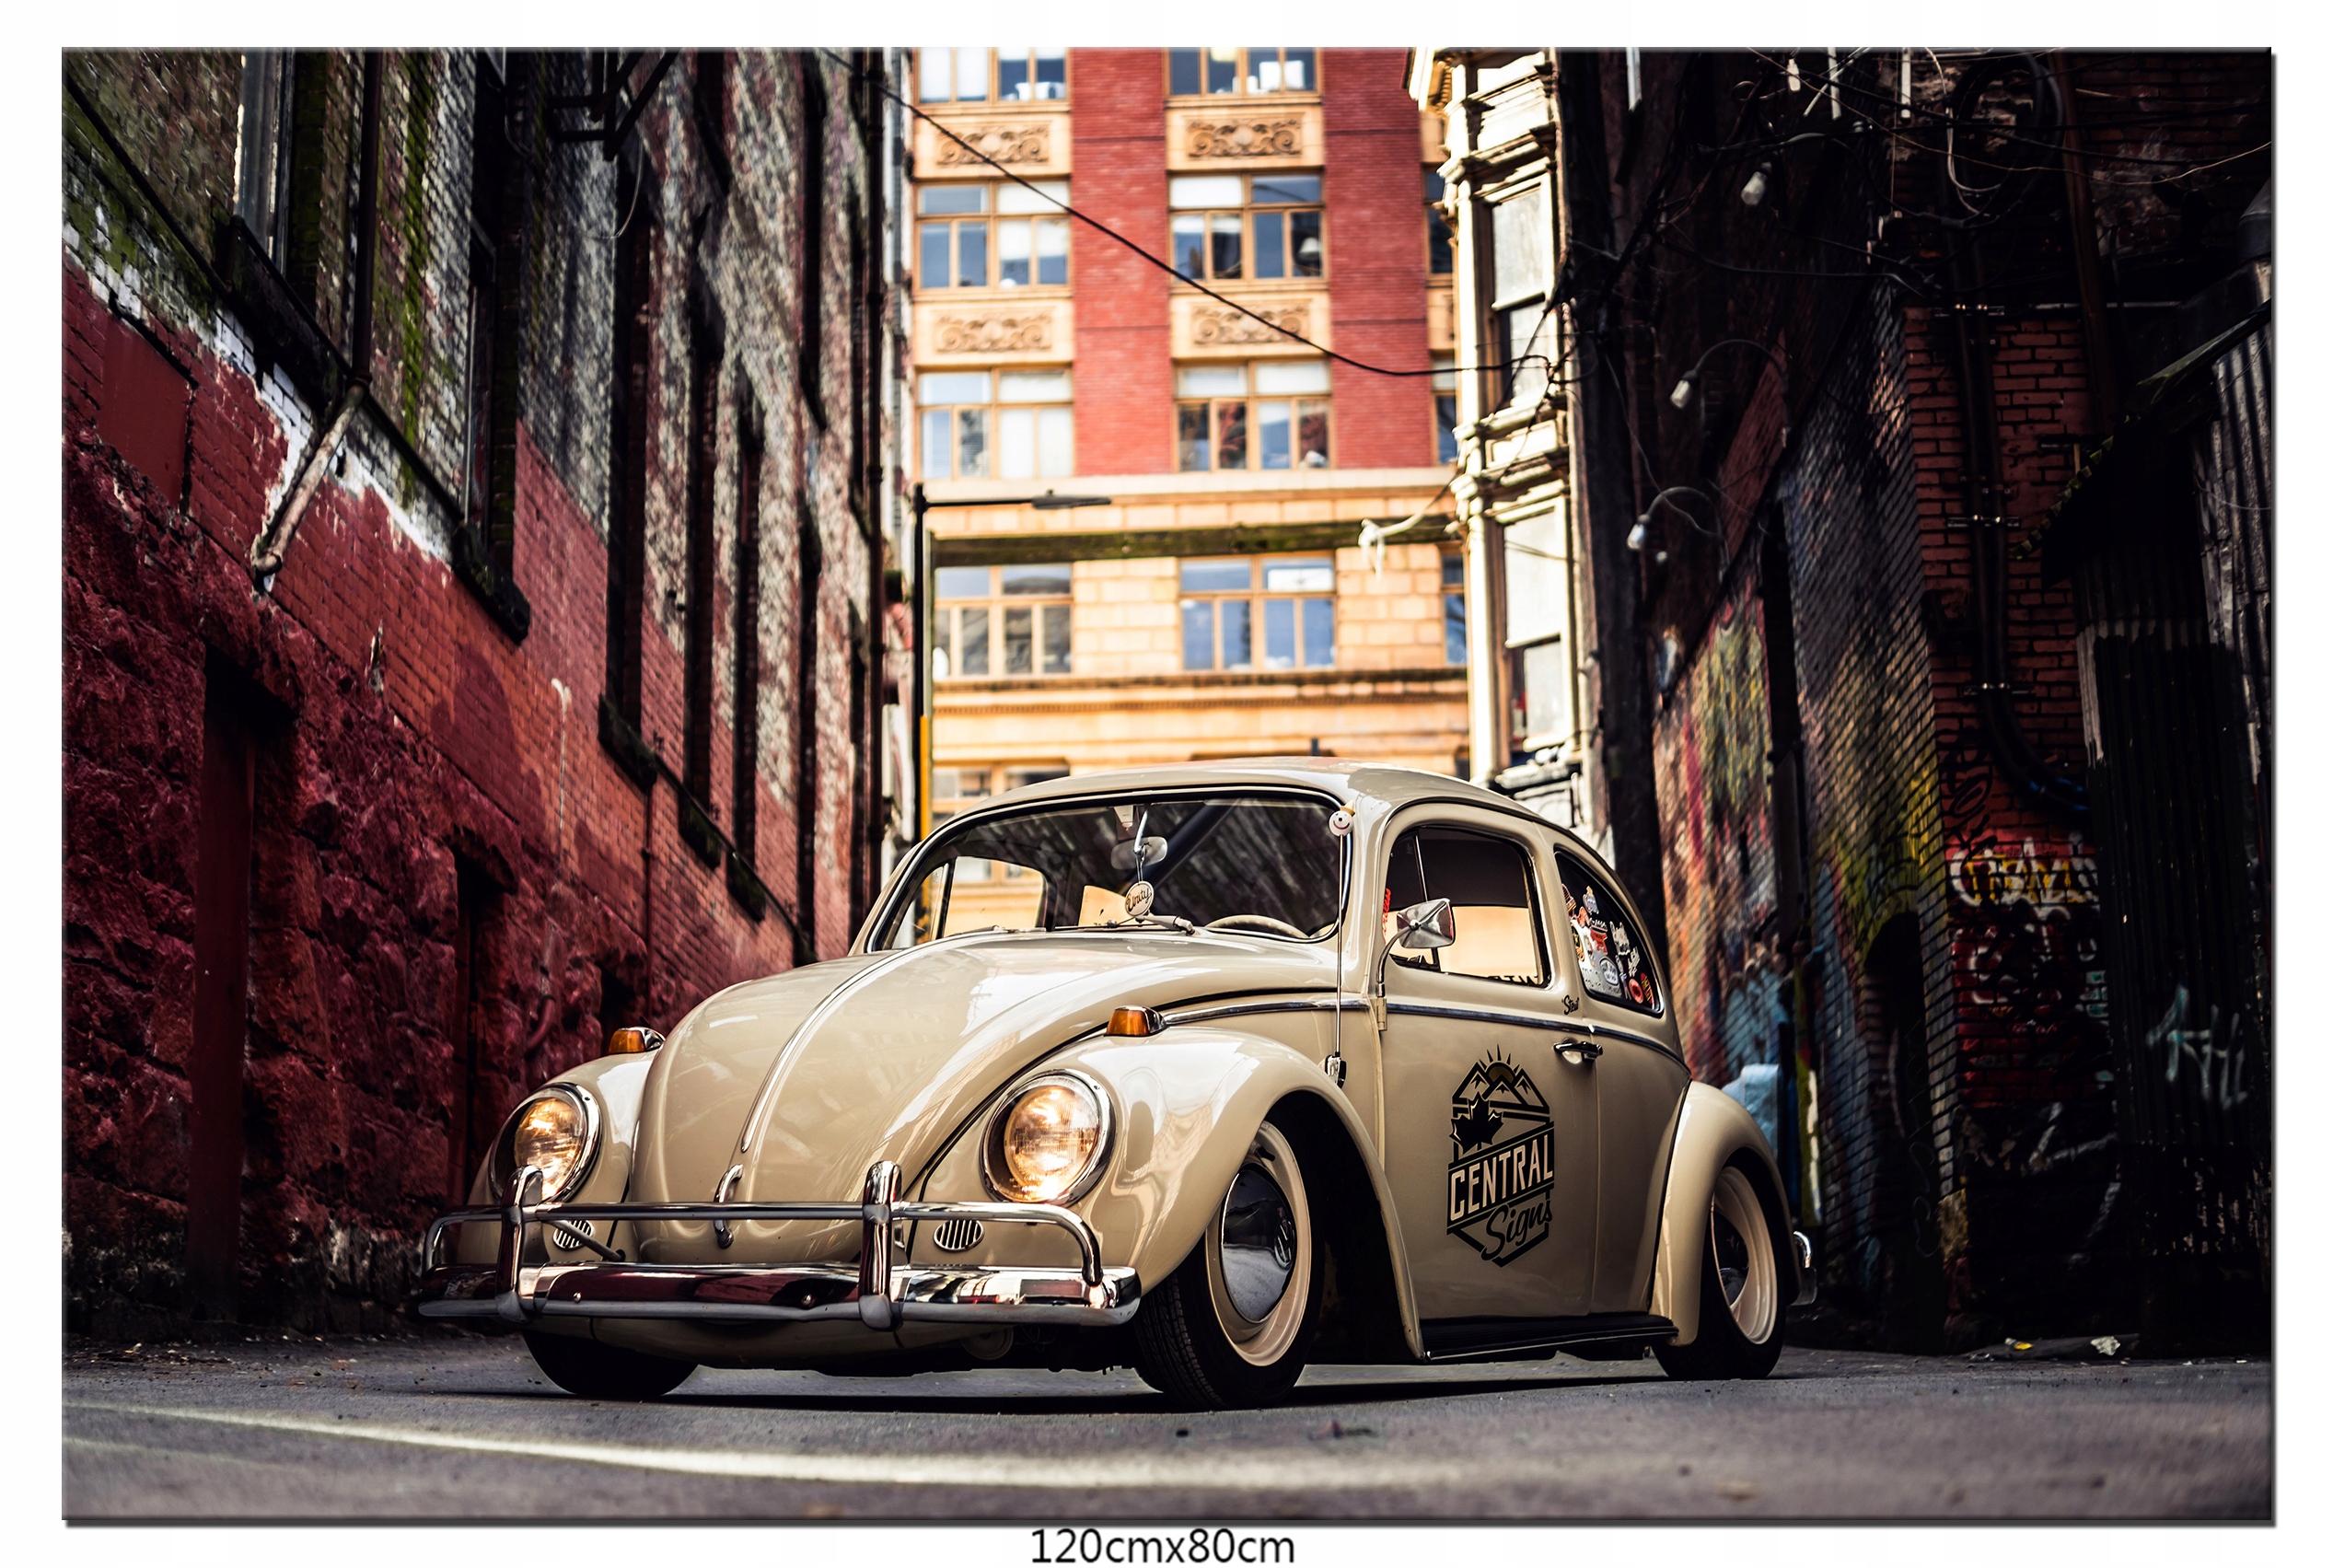 Obraz Auto Samochód VW Volkswagen Garbus